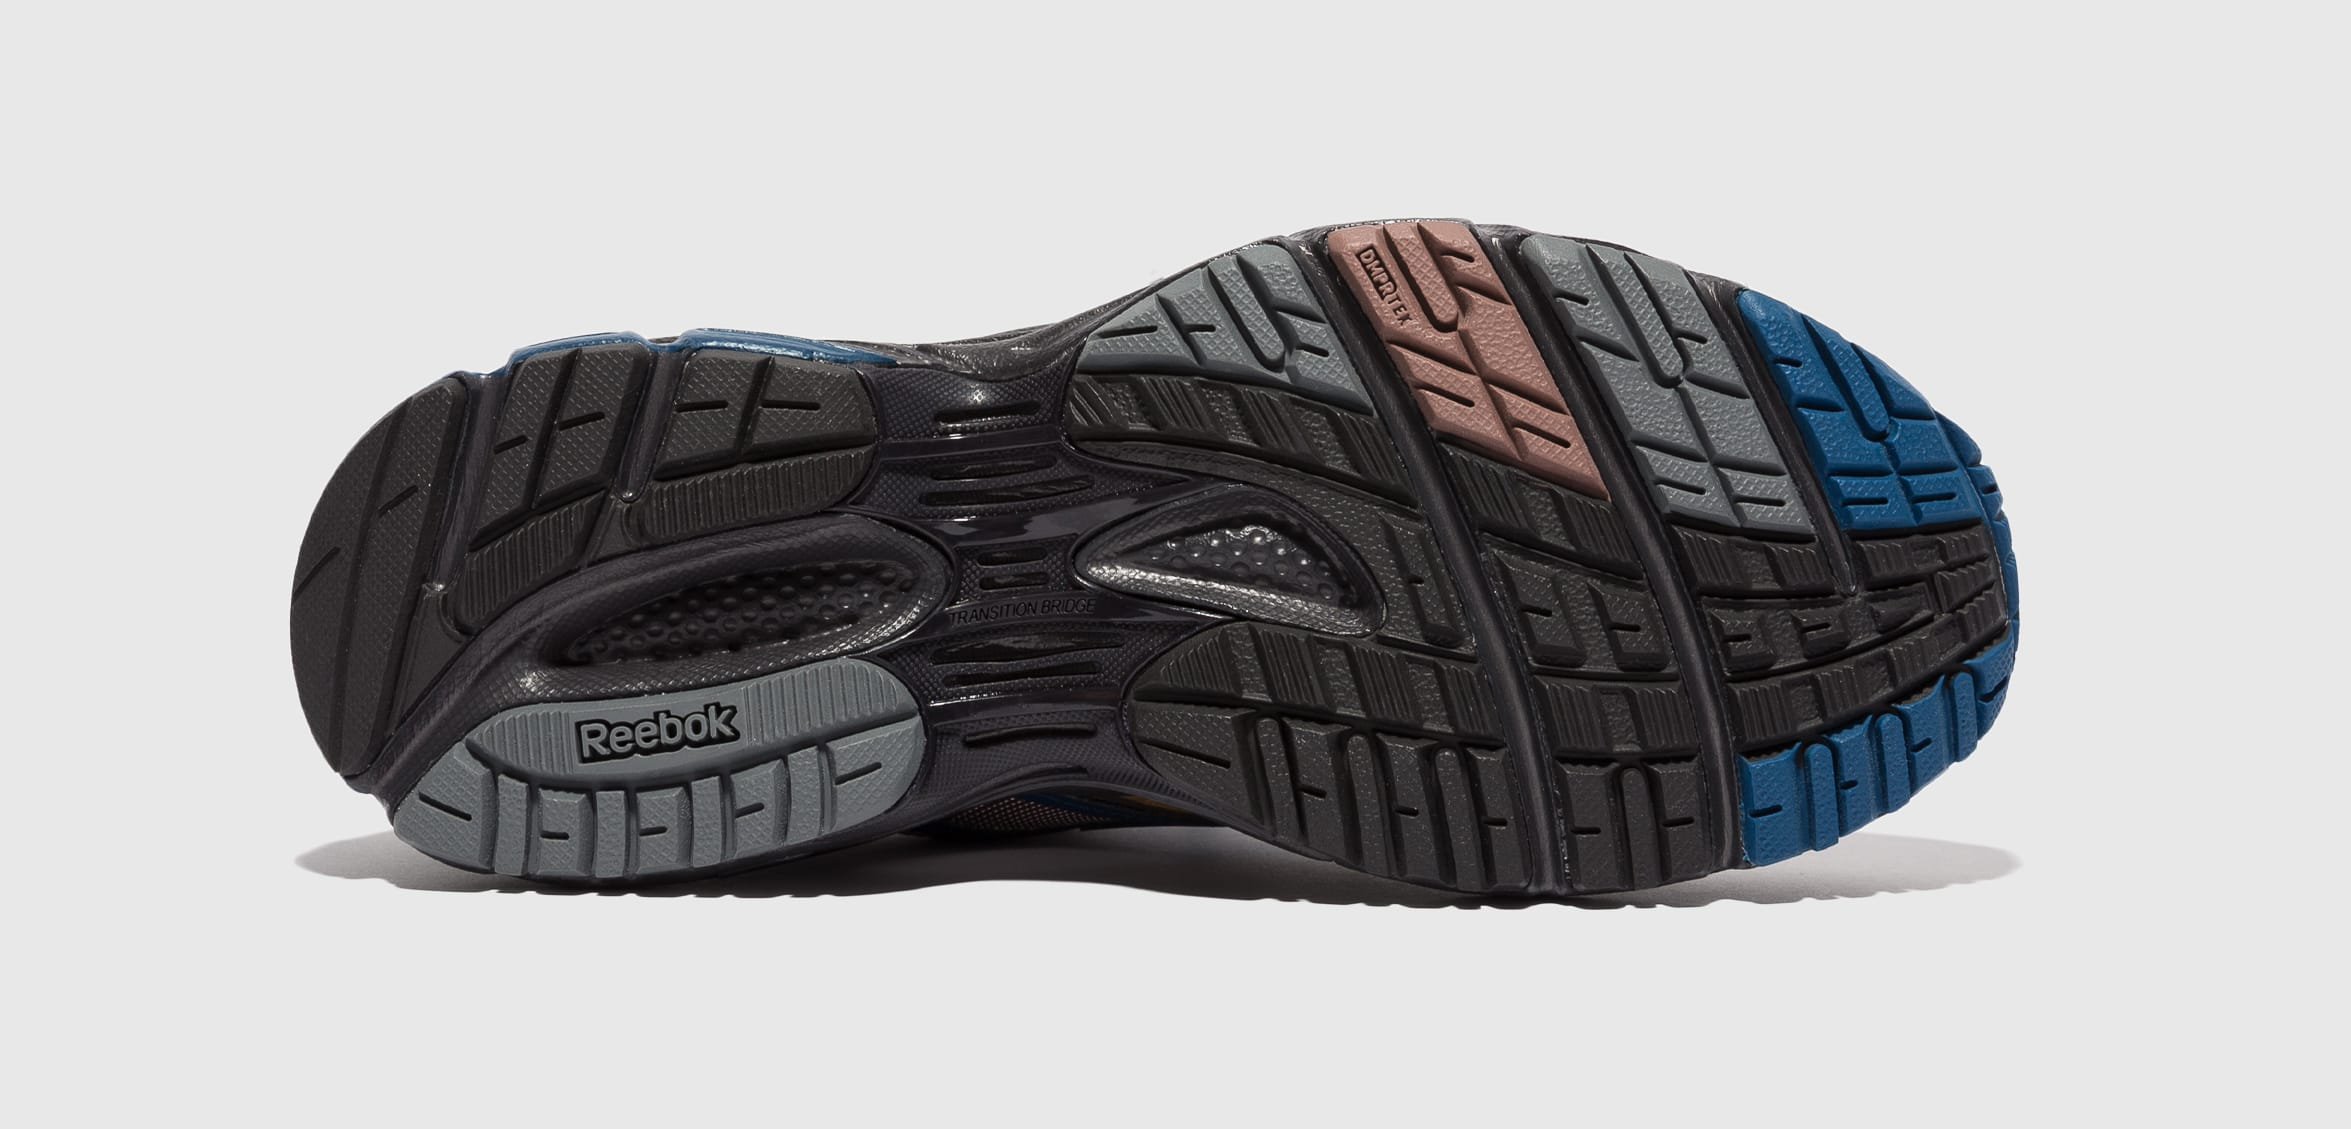 Packer Shoes x Reebok Trinity Premier Brown FY3408 Outsole